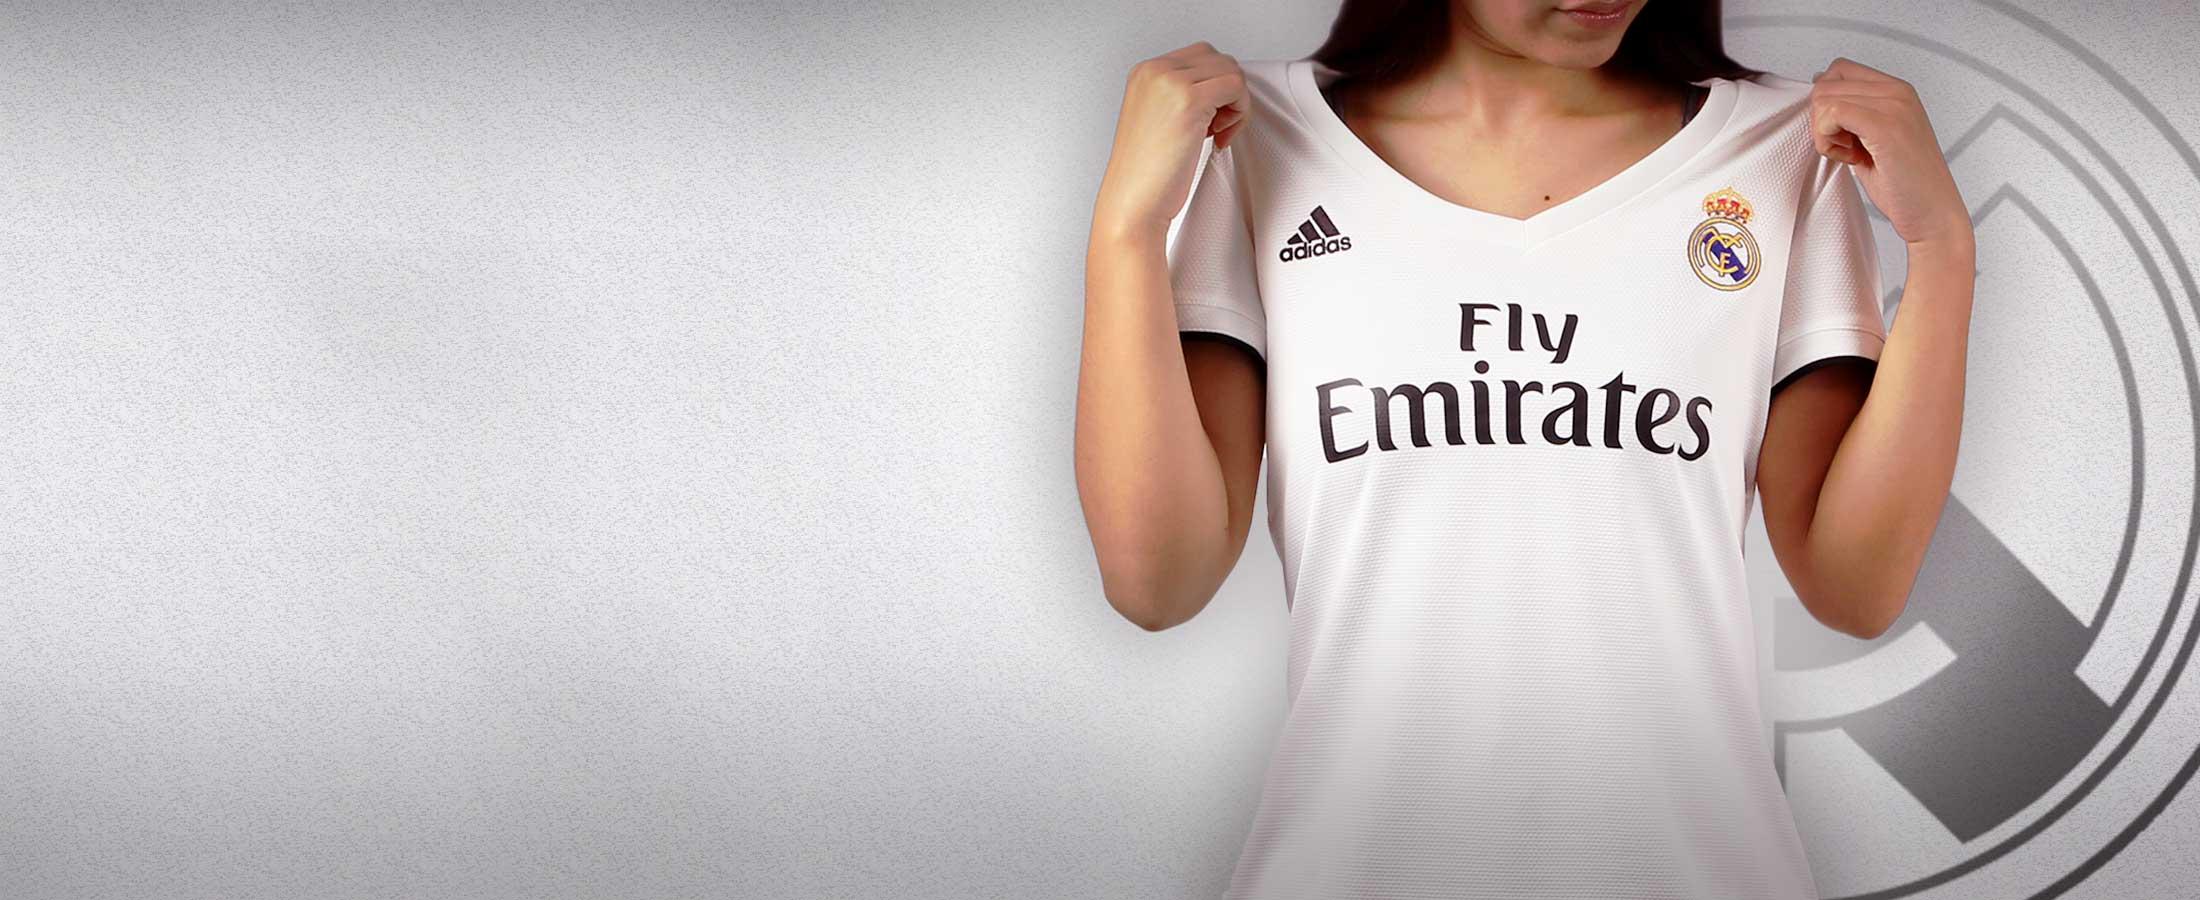 Camiseta oficial mujer del Real Madrid